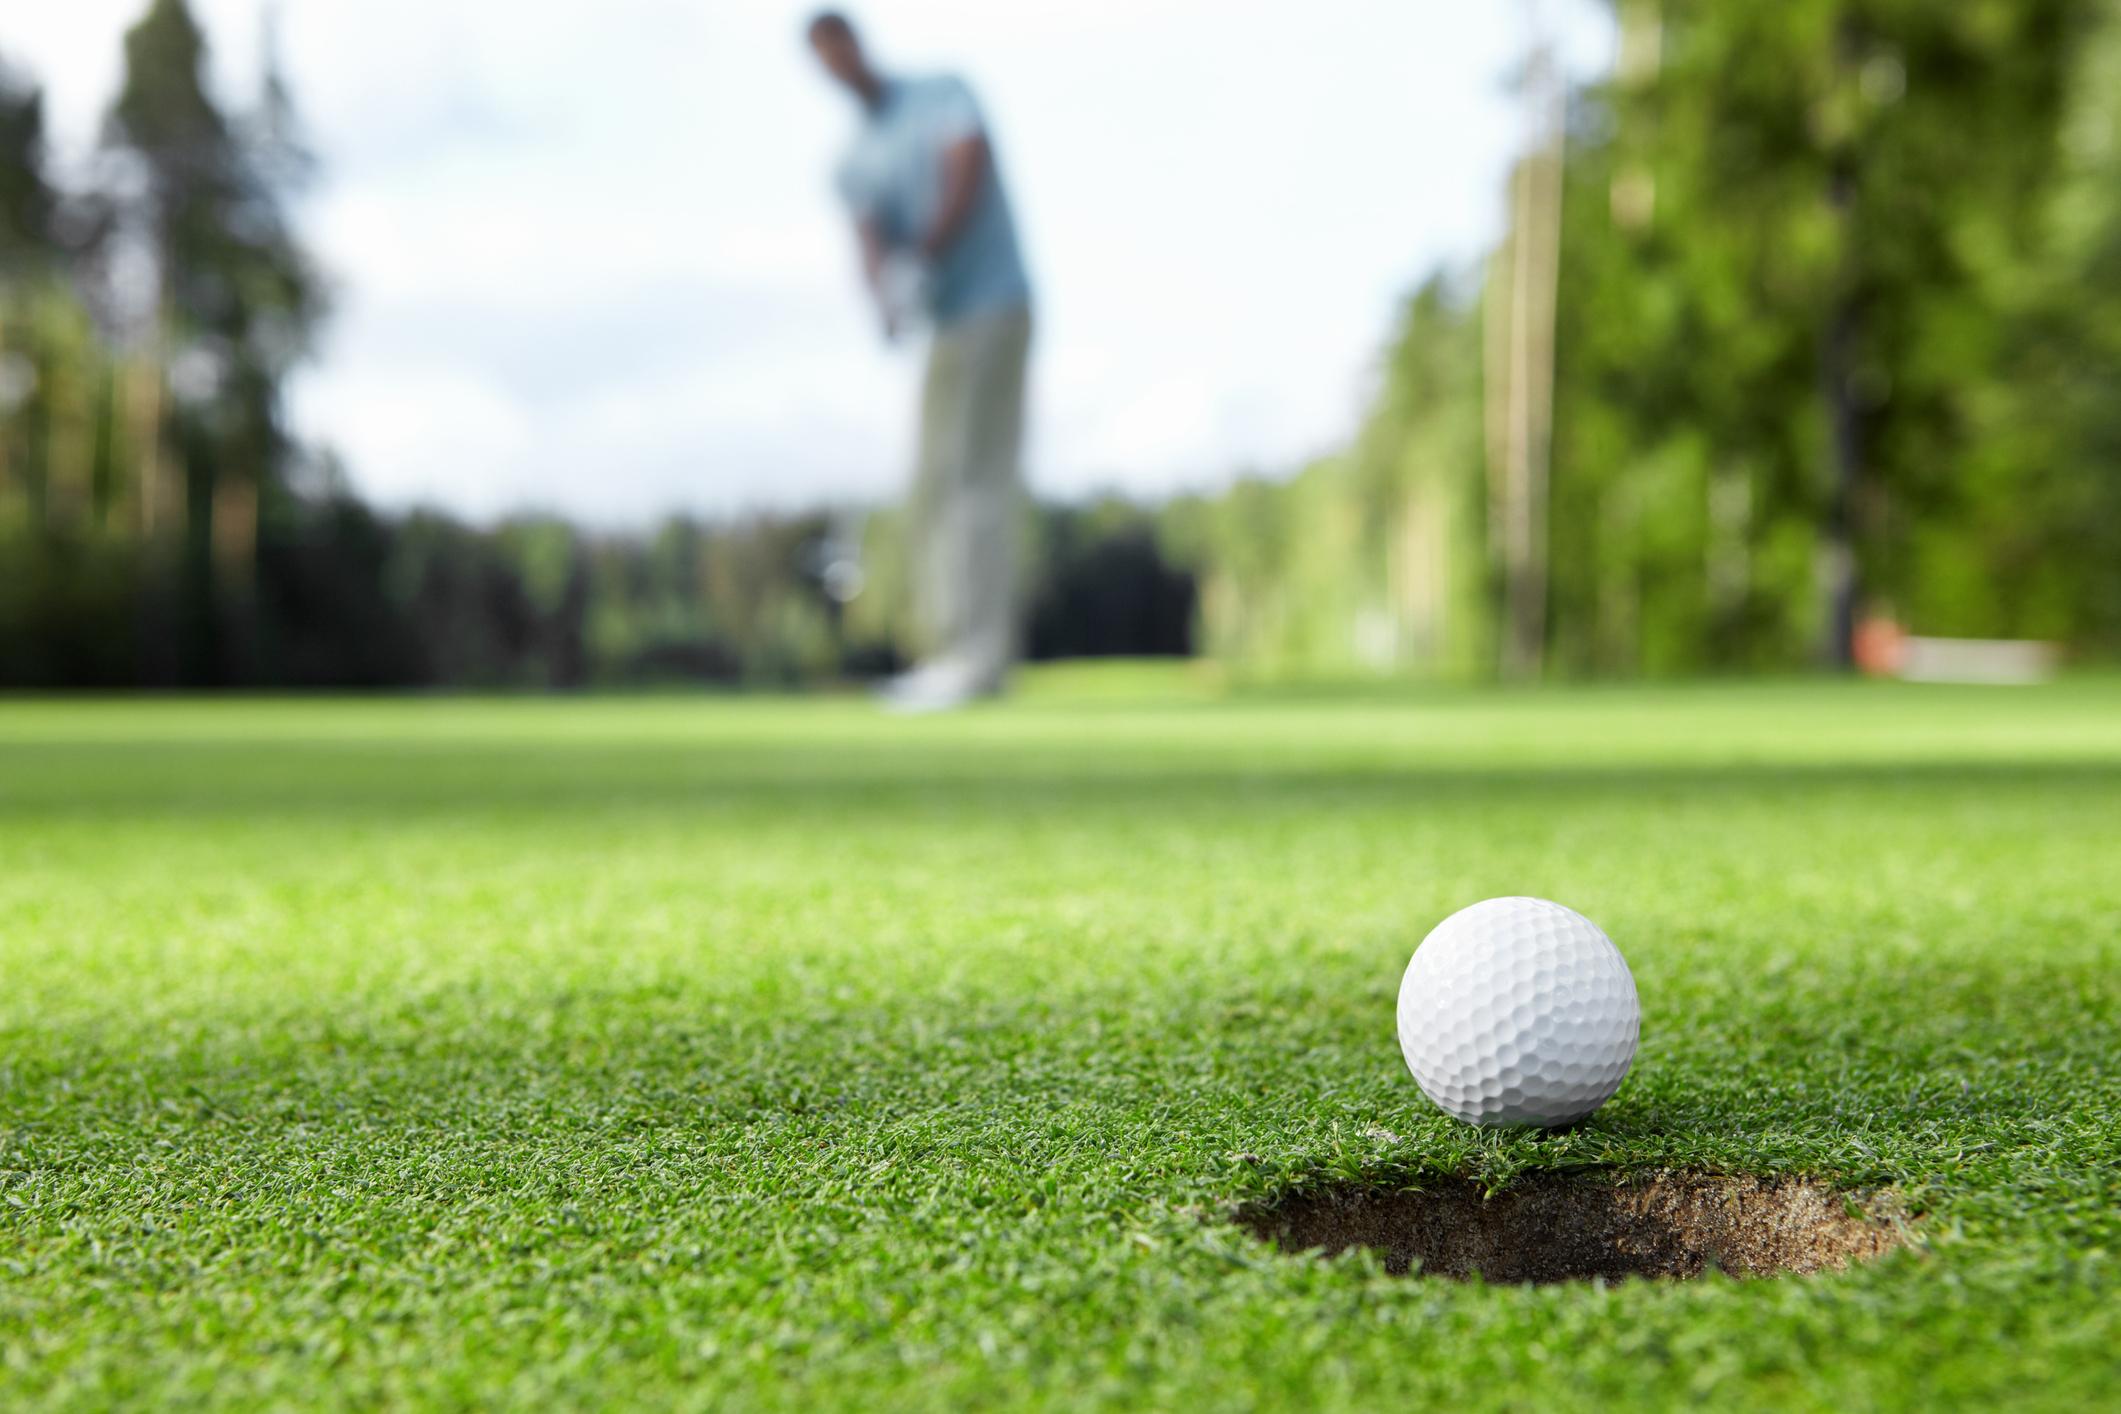 Torstar partners with retailer Golf Town to acquire SCOREGolf magazine